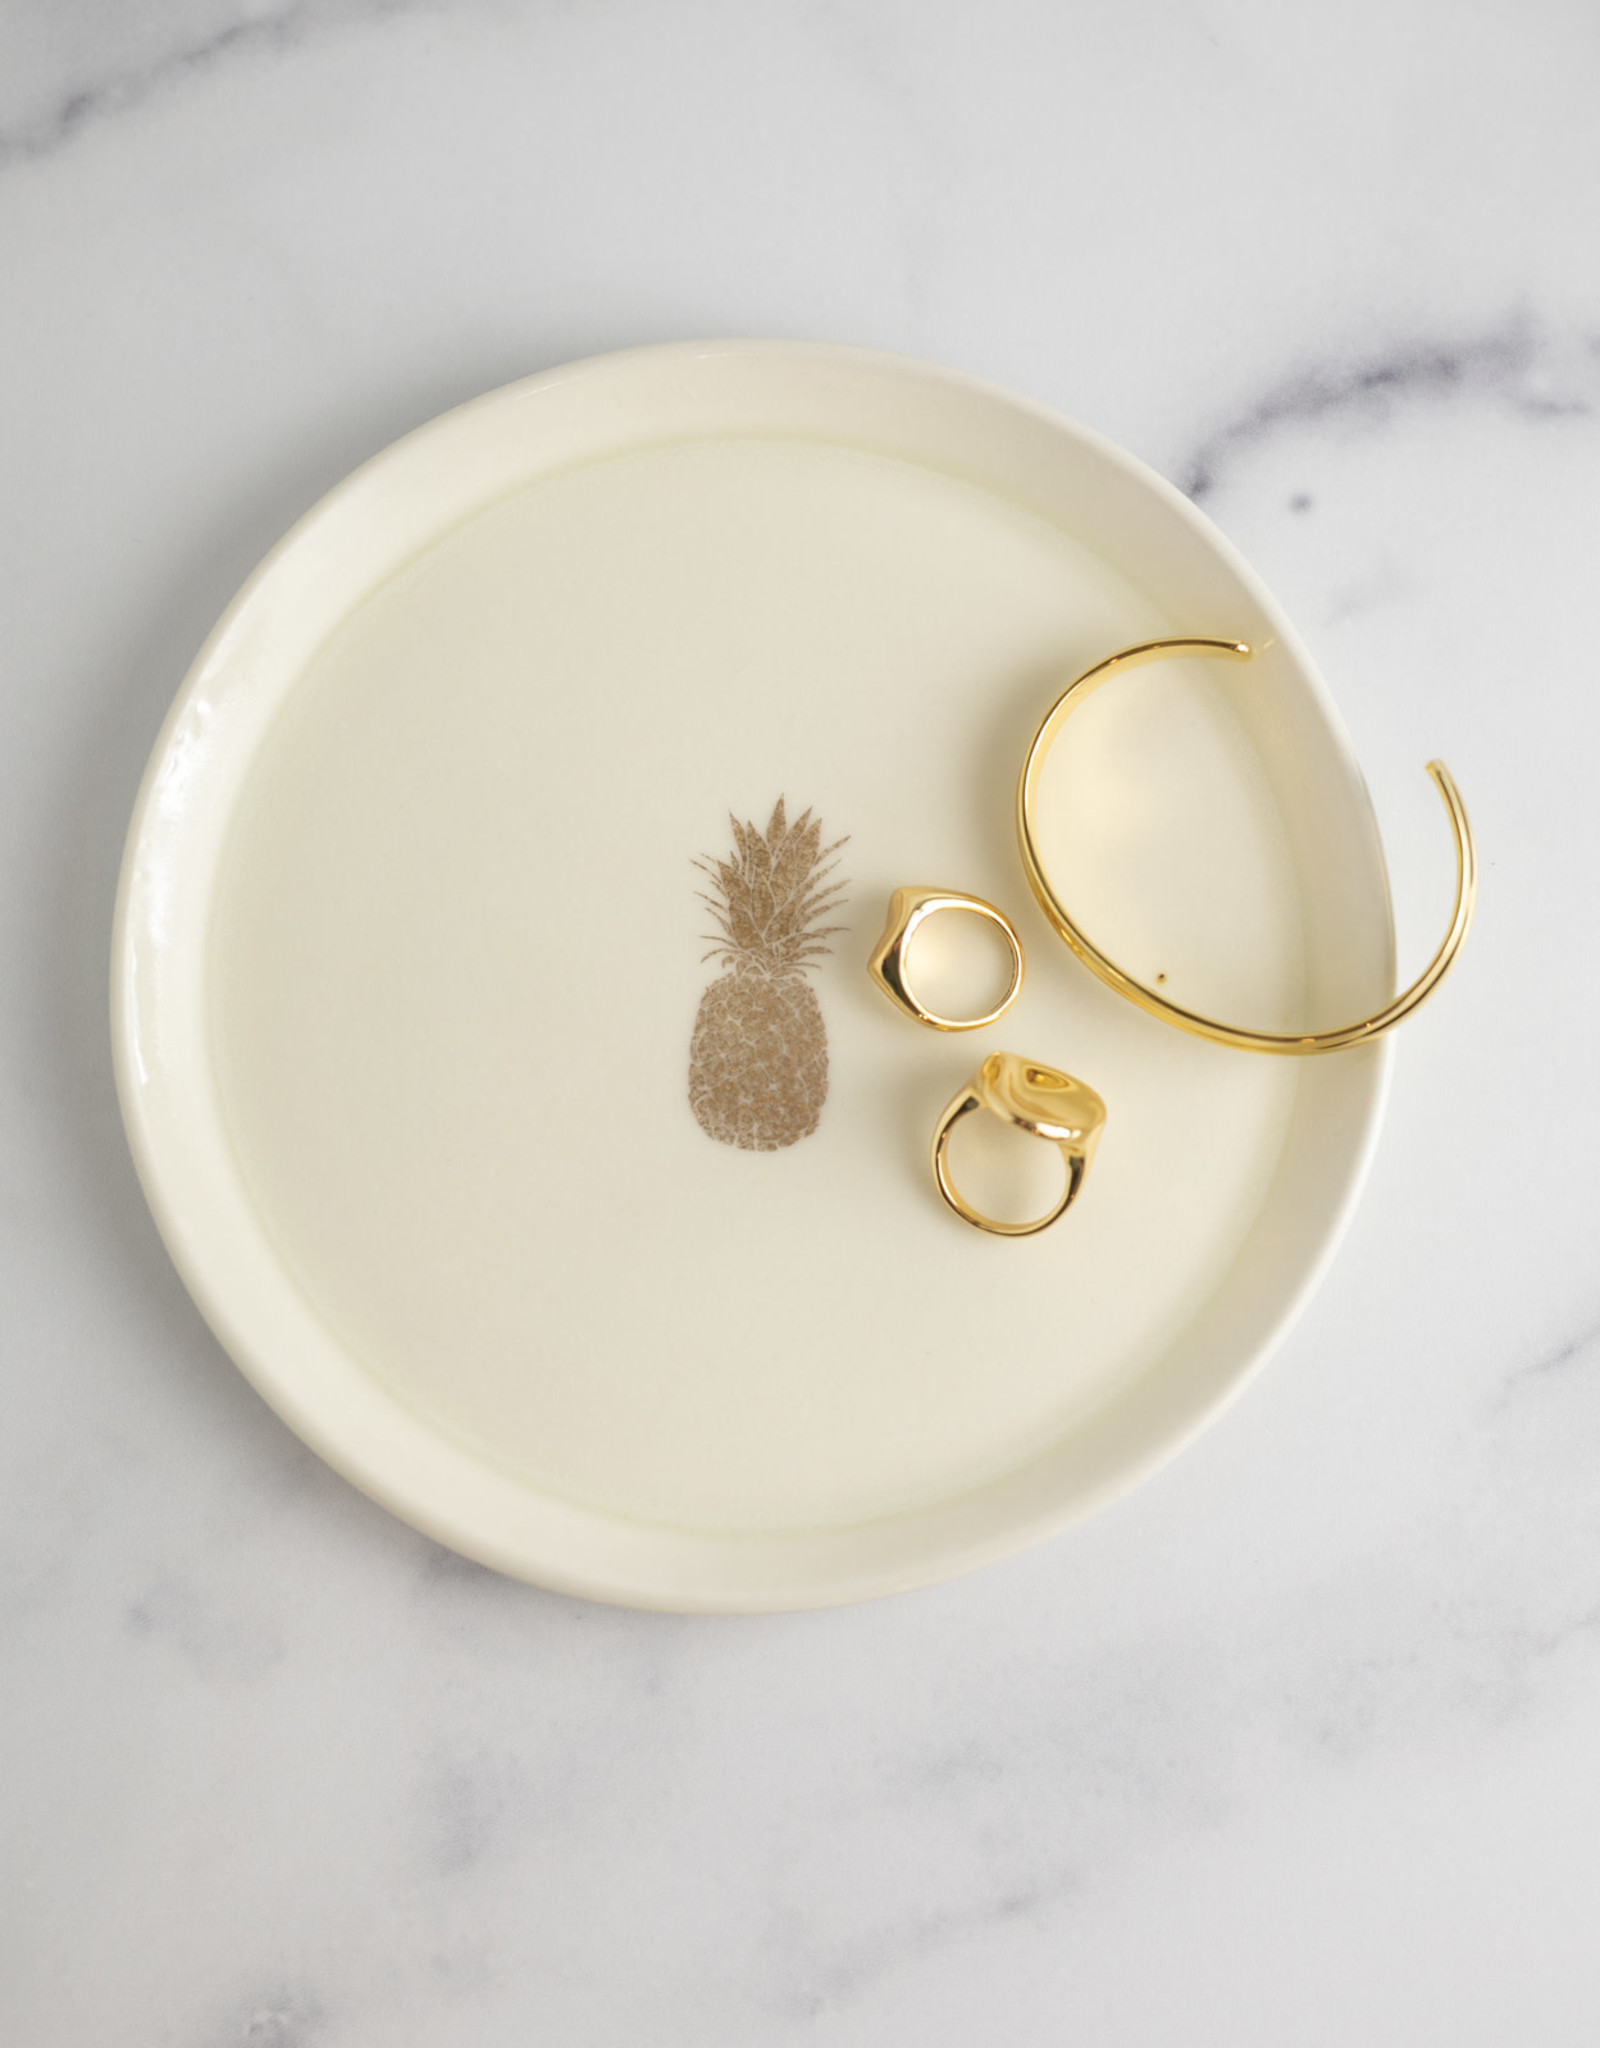 Valentina Guevara - Stoneware Catchtray with Gold Pineapple